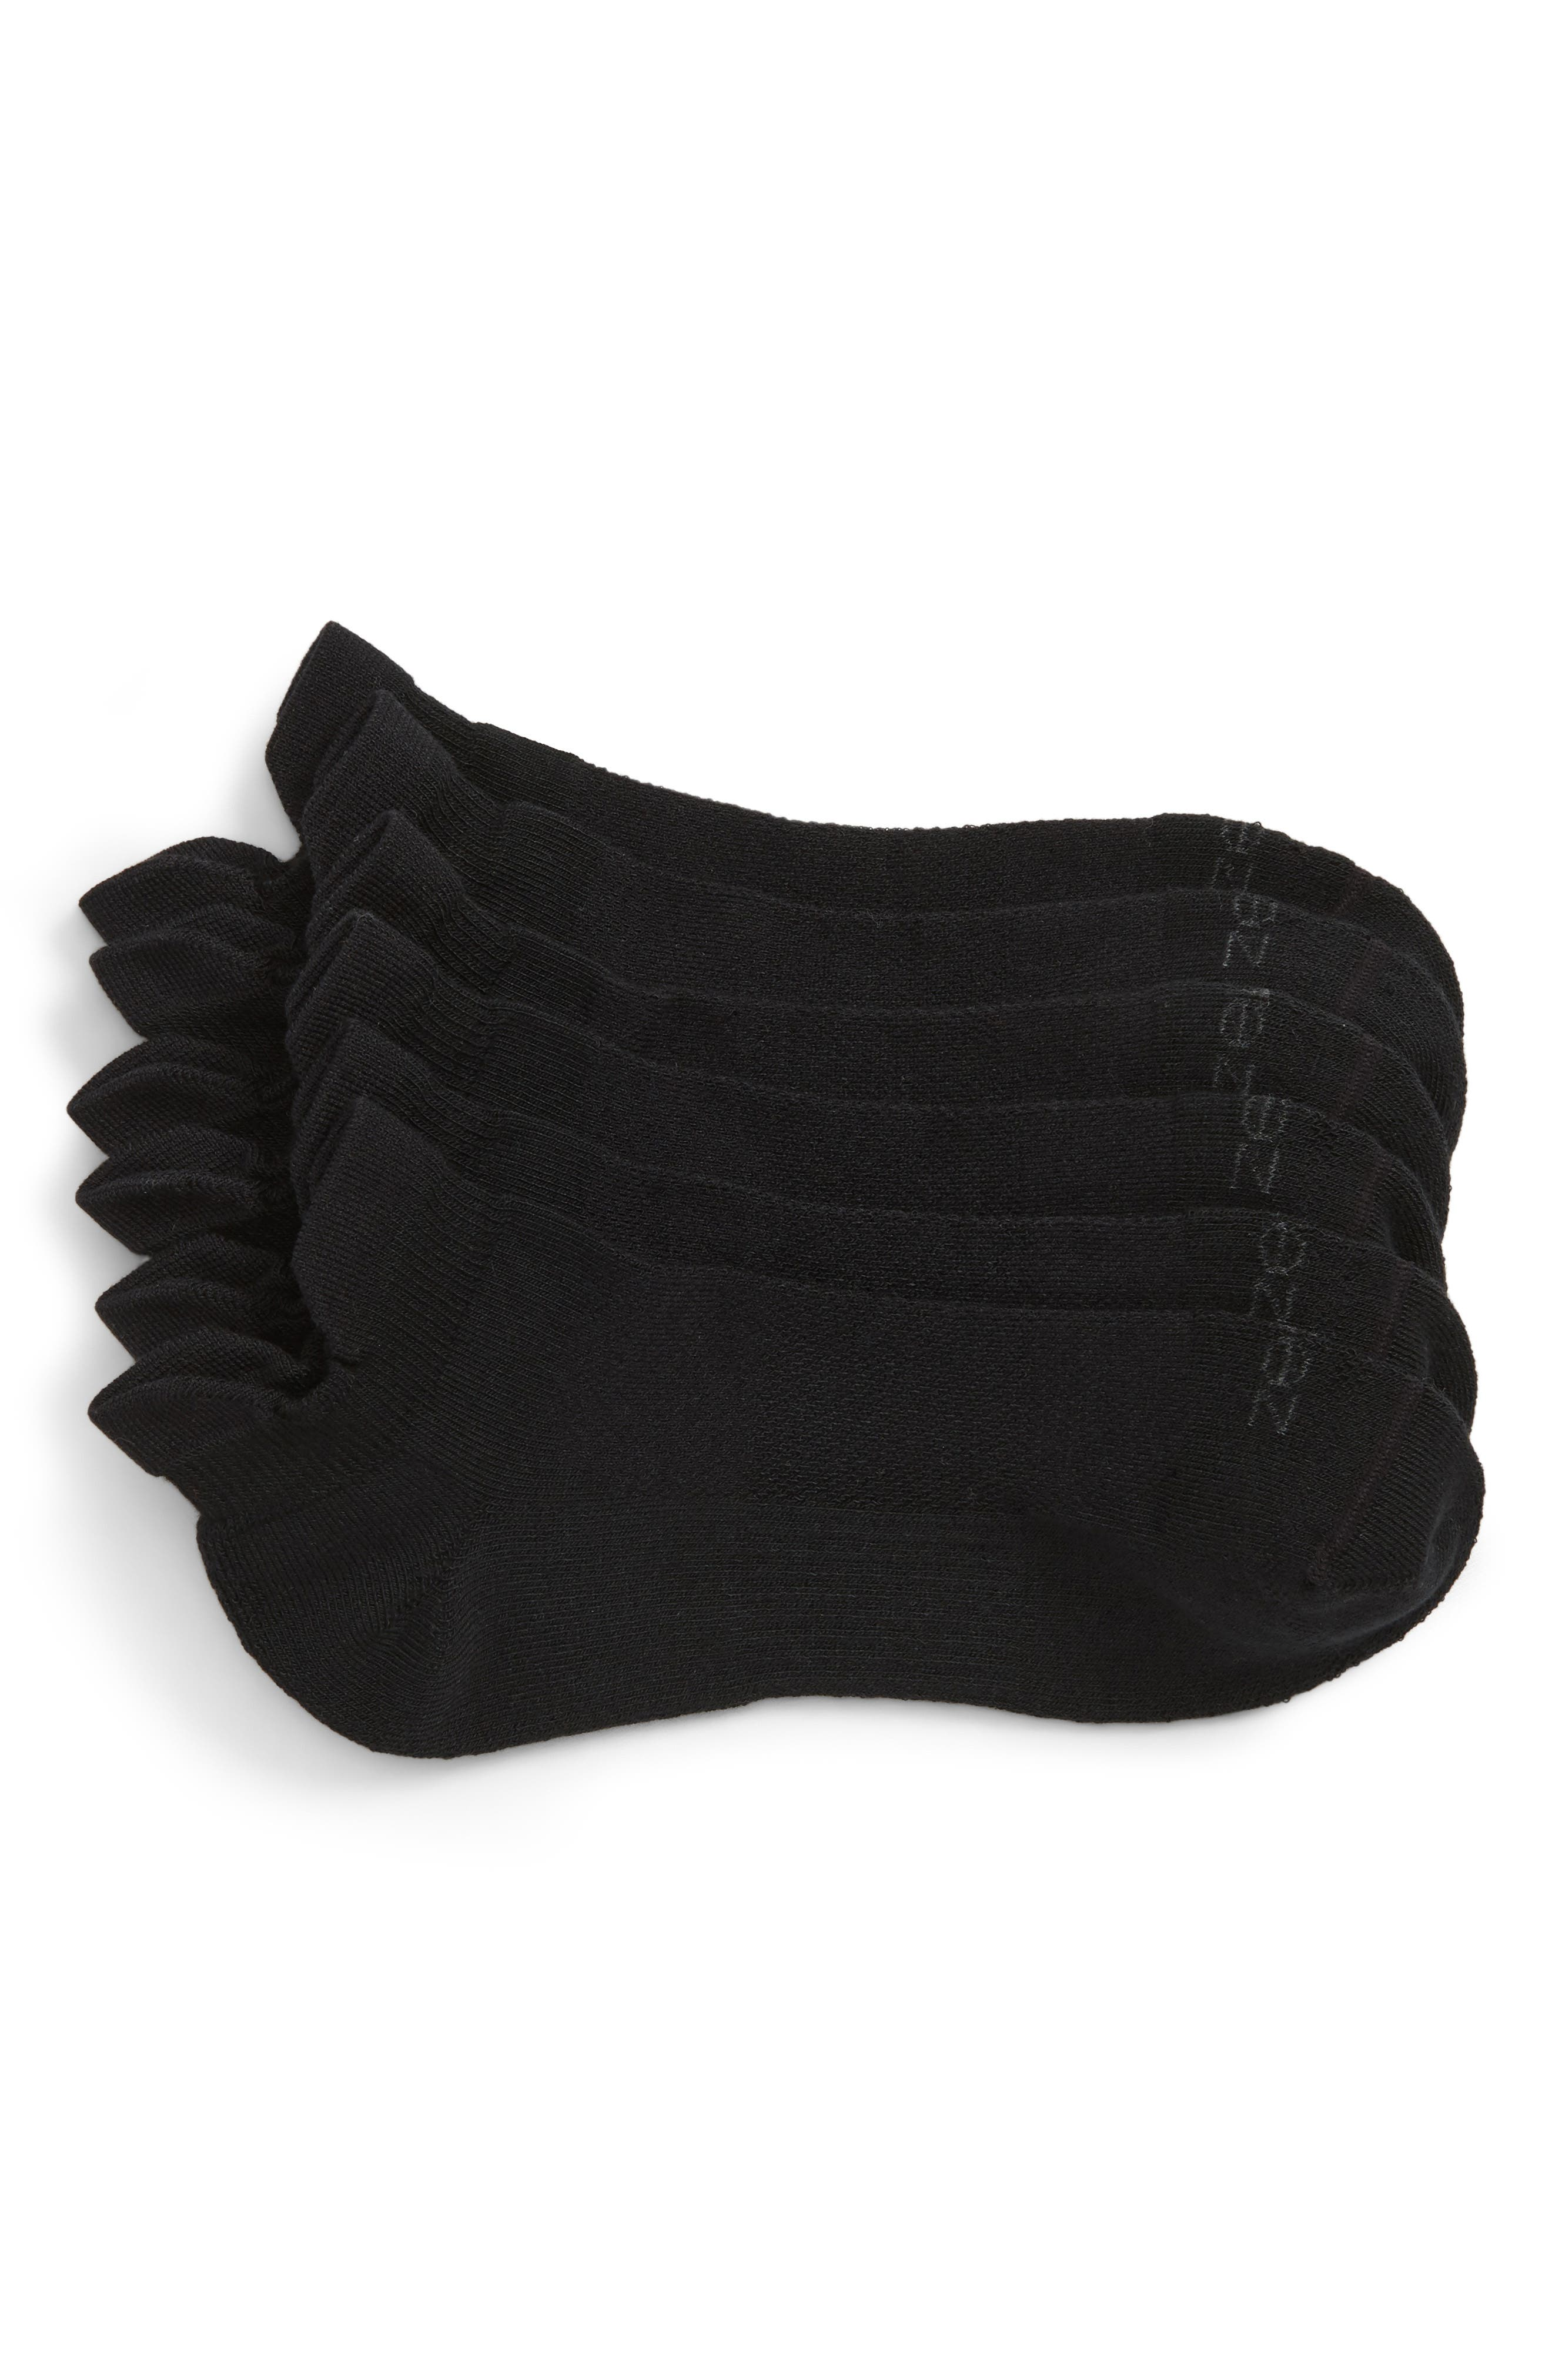 ZELLA, 3-Pack Double Tab Running Socks, Main thumbnail 1, color, BLACK